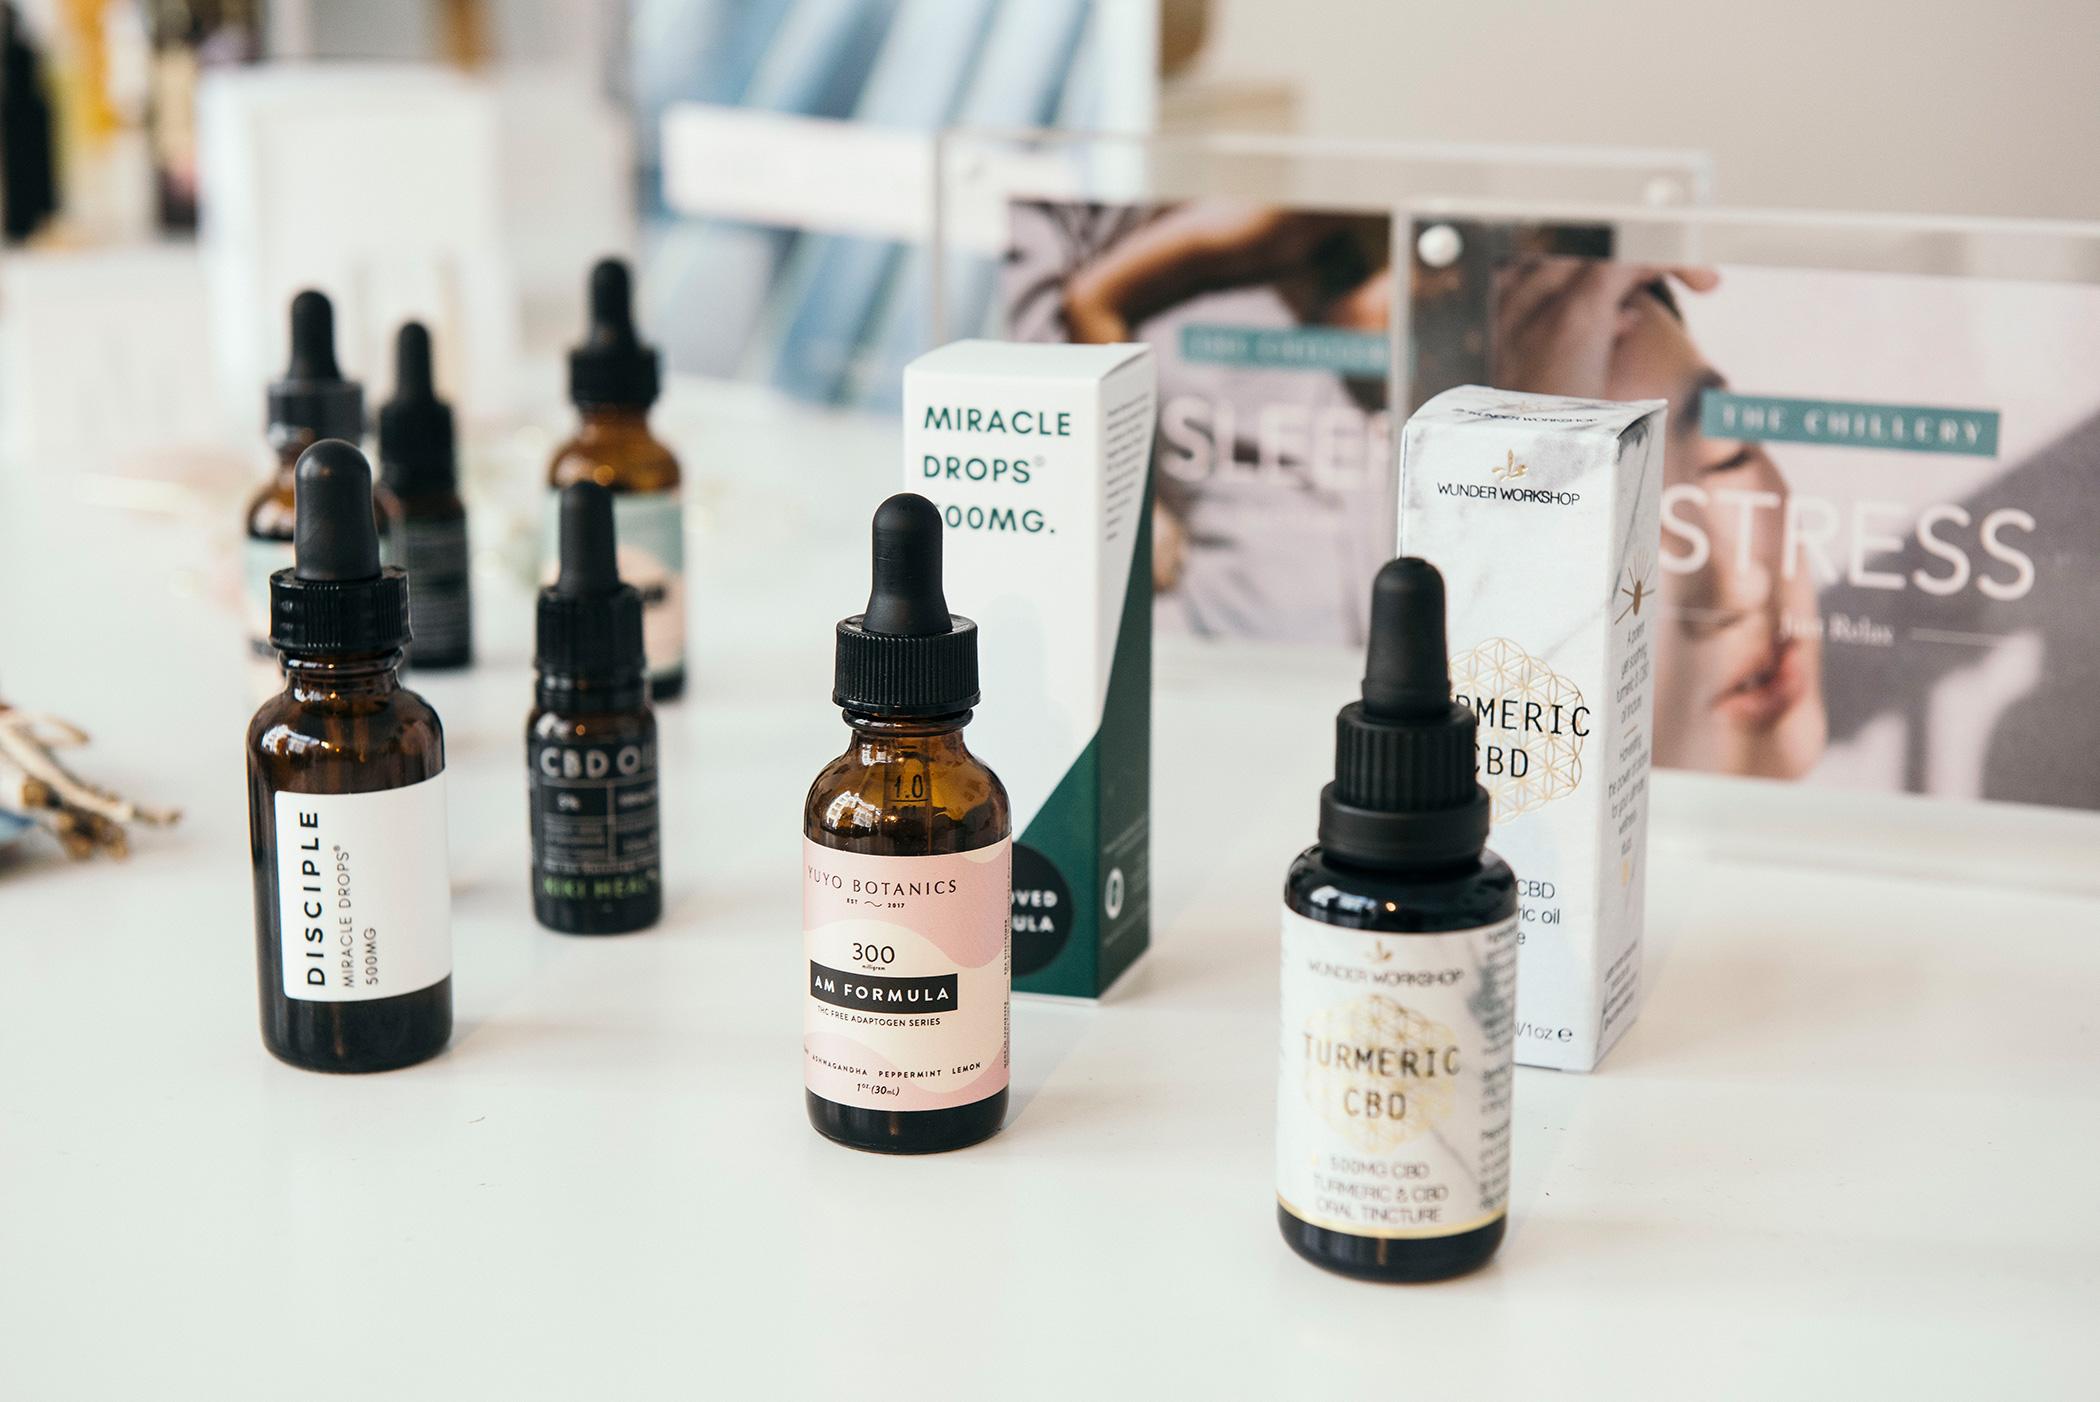 femtastics-The-Chillery-CBD-Beauty-Produkte